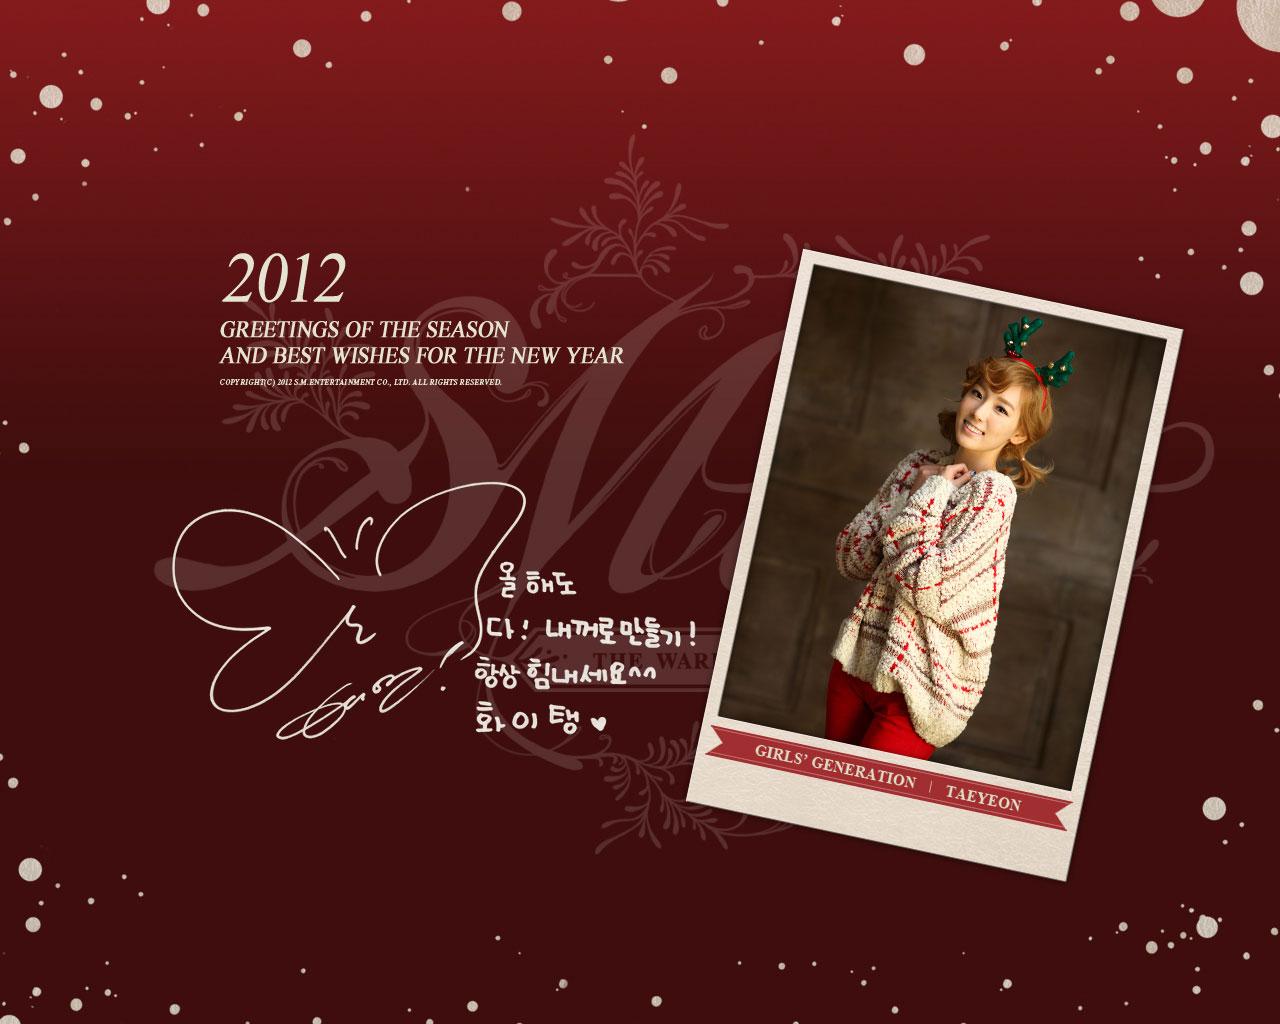 http://3.bp.blogspot.com/-HXBIOmbirG8/T2bASSJ0YSI/AAAAAAAAAlQ/wjRhH9SsSSE/s1600/taeyeon-2012-new-year-wallpaper.jpg